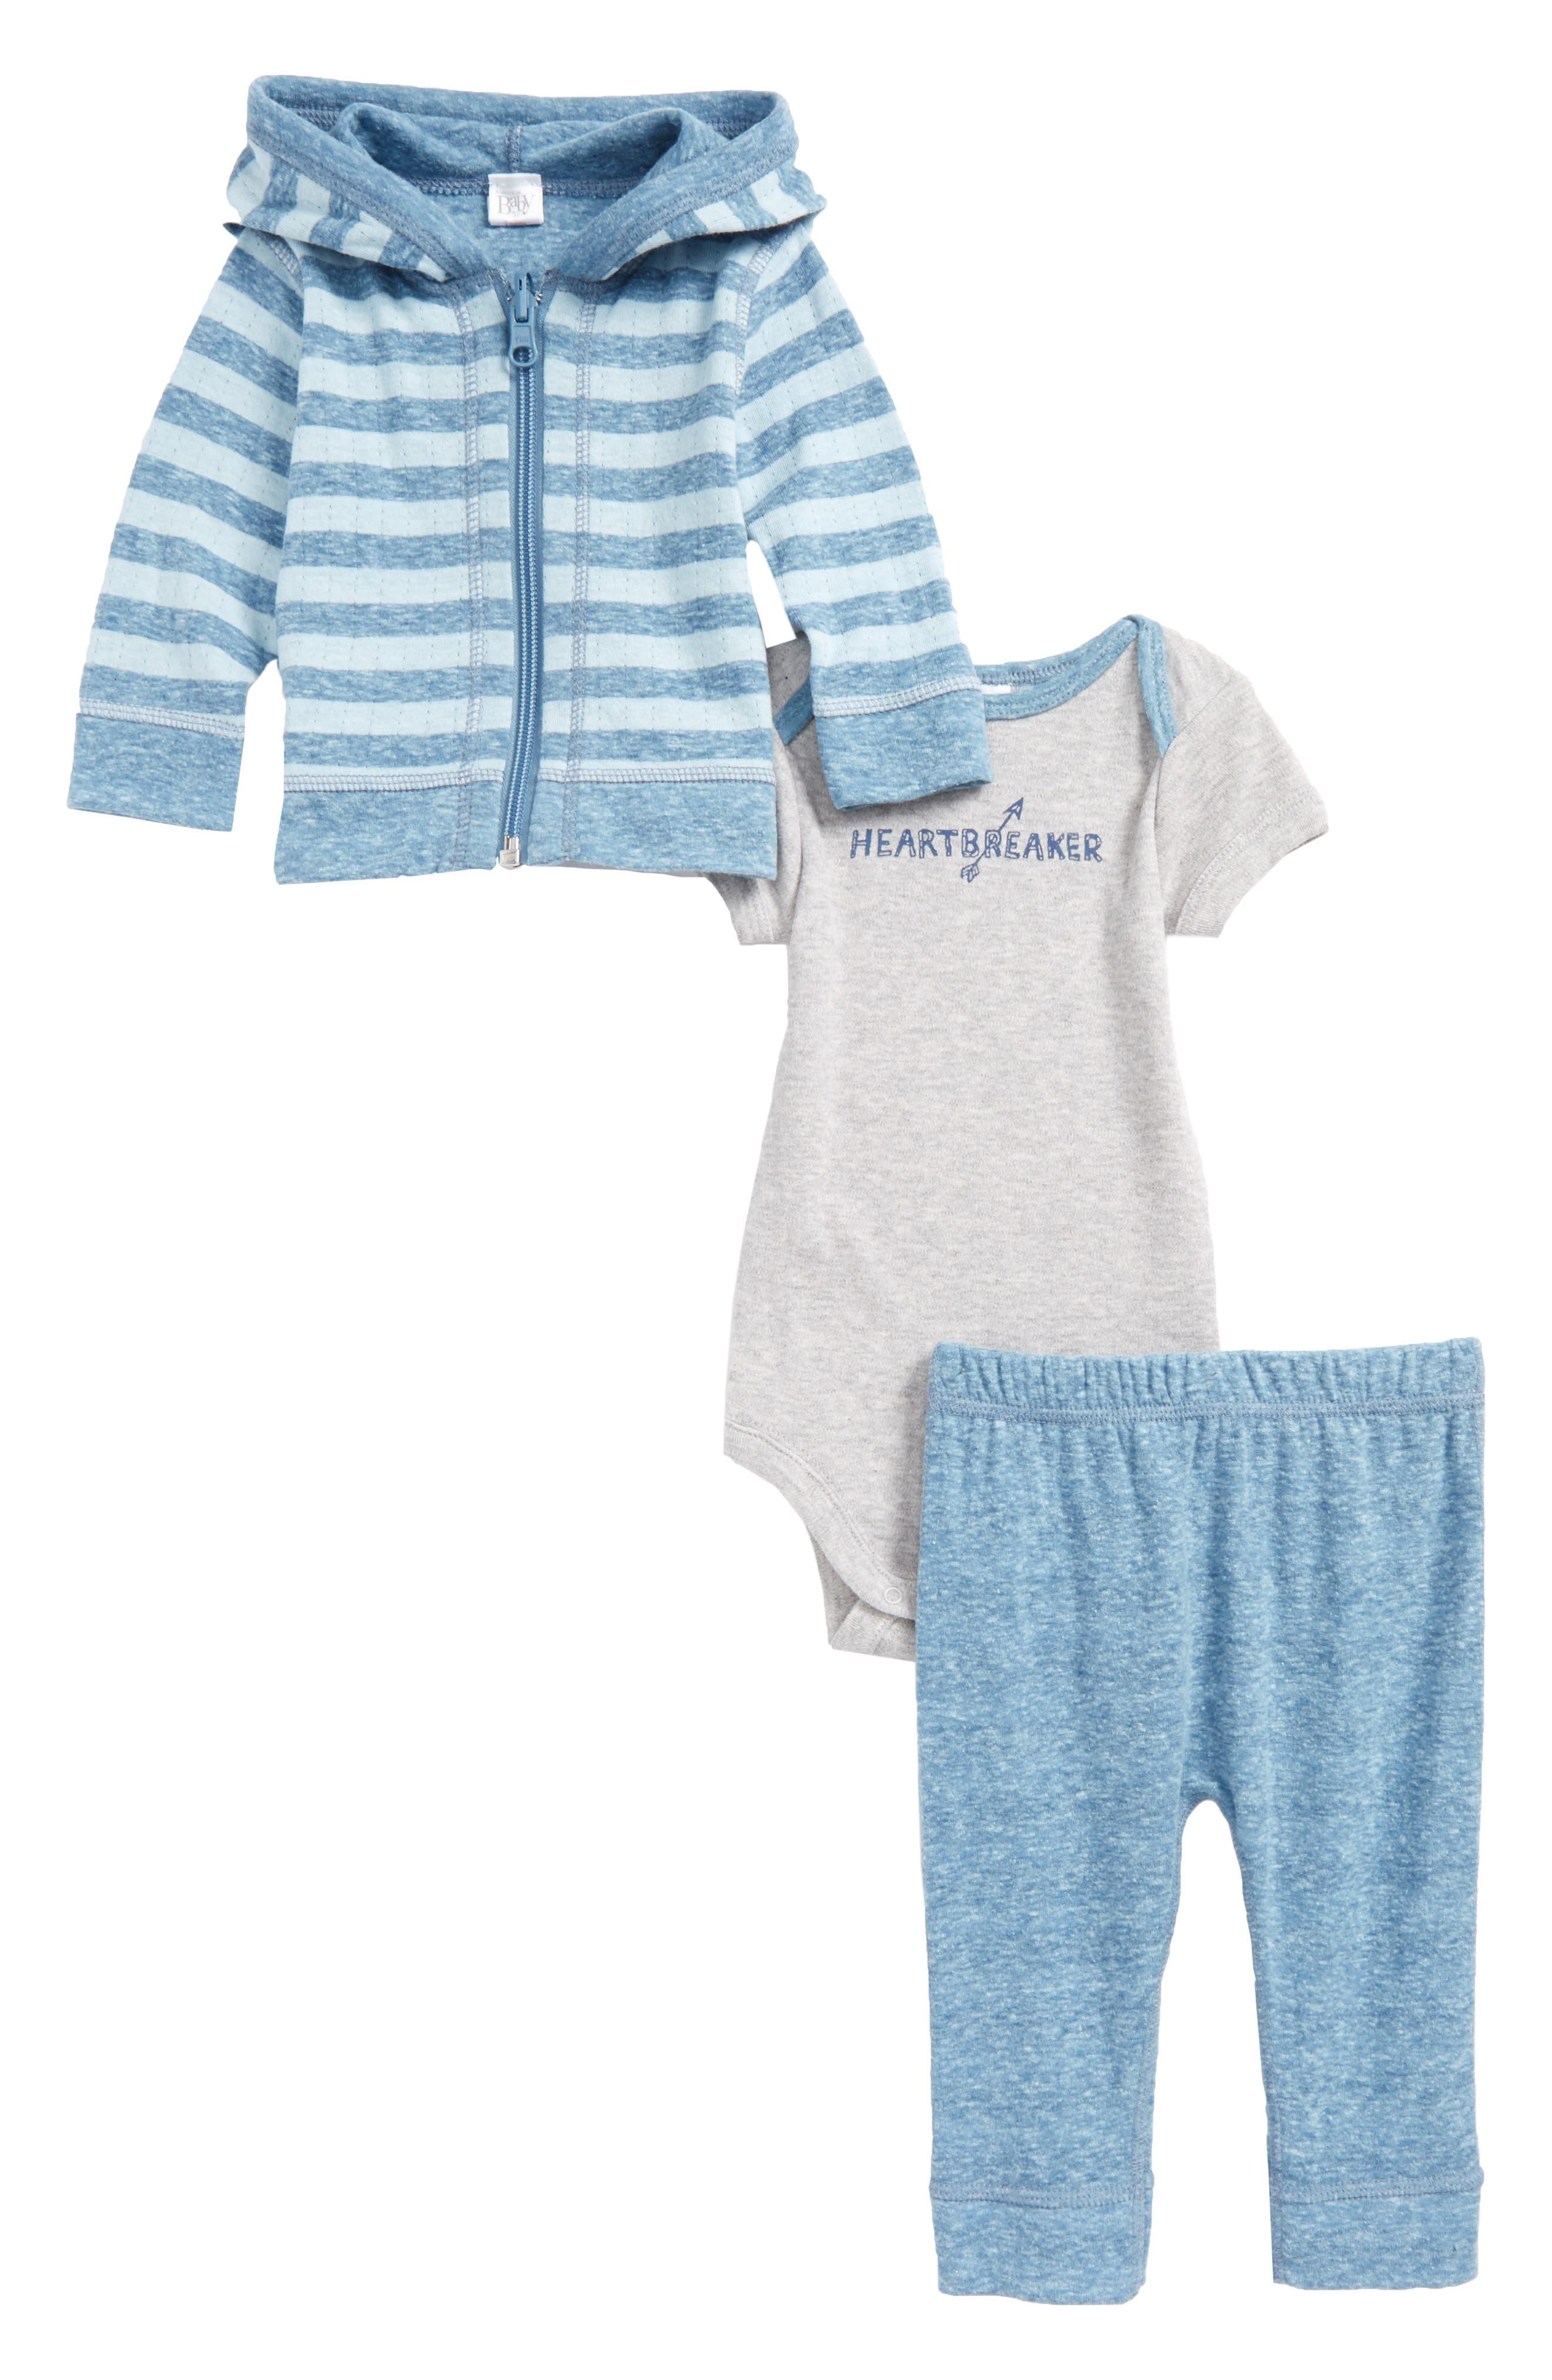 Reversible Zip Hoodie, Bodysuit & Pants Set,                             Main thumbnail 1, color,                             Blue Dark- Ivory Stripe